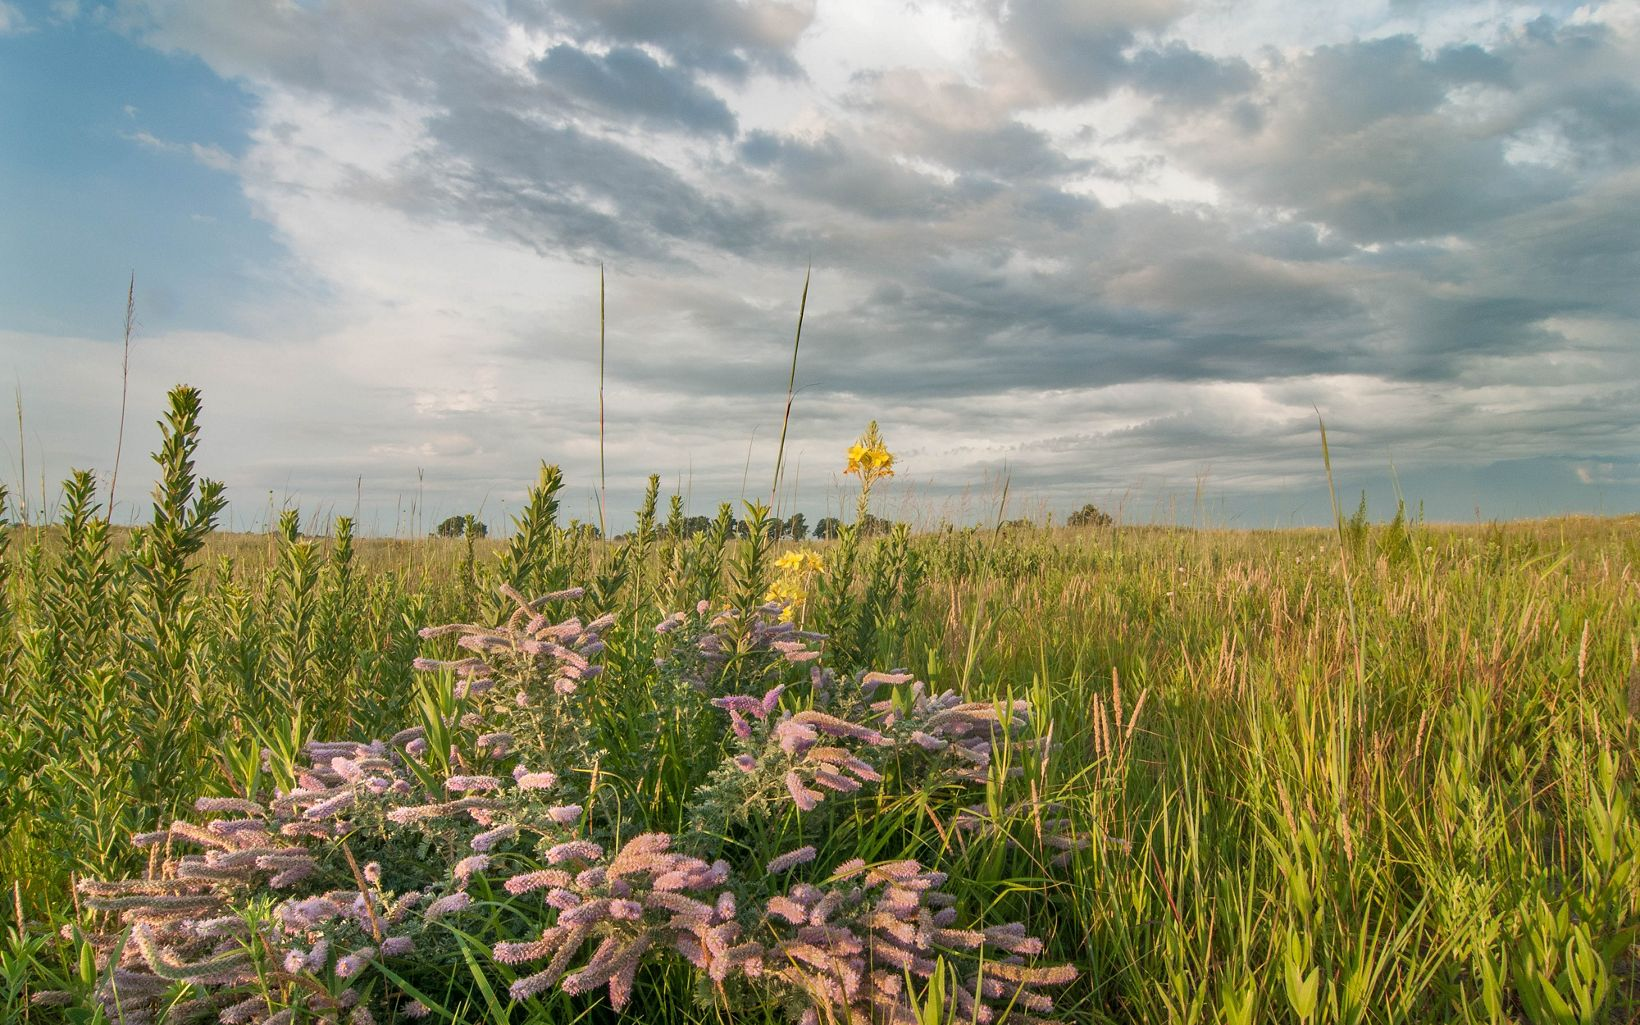 Silky prairie clover and restored sand prairie at The Nature Conservancy's Platte River Prairies, Nebraska.